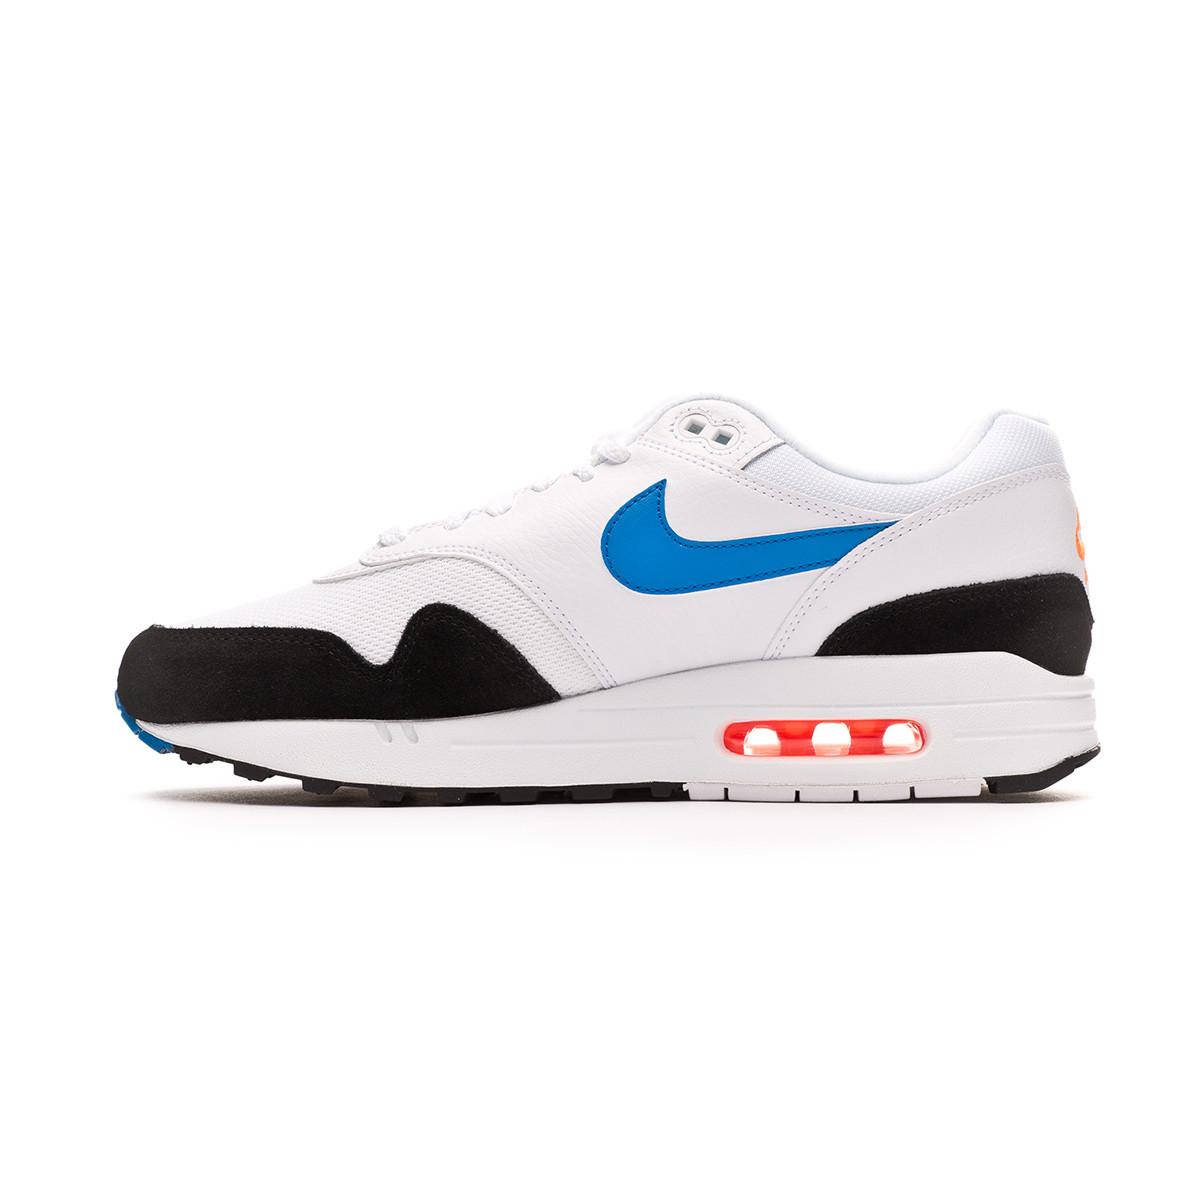 nike air max 1 white blue orange